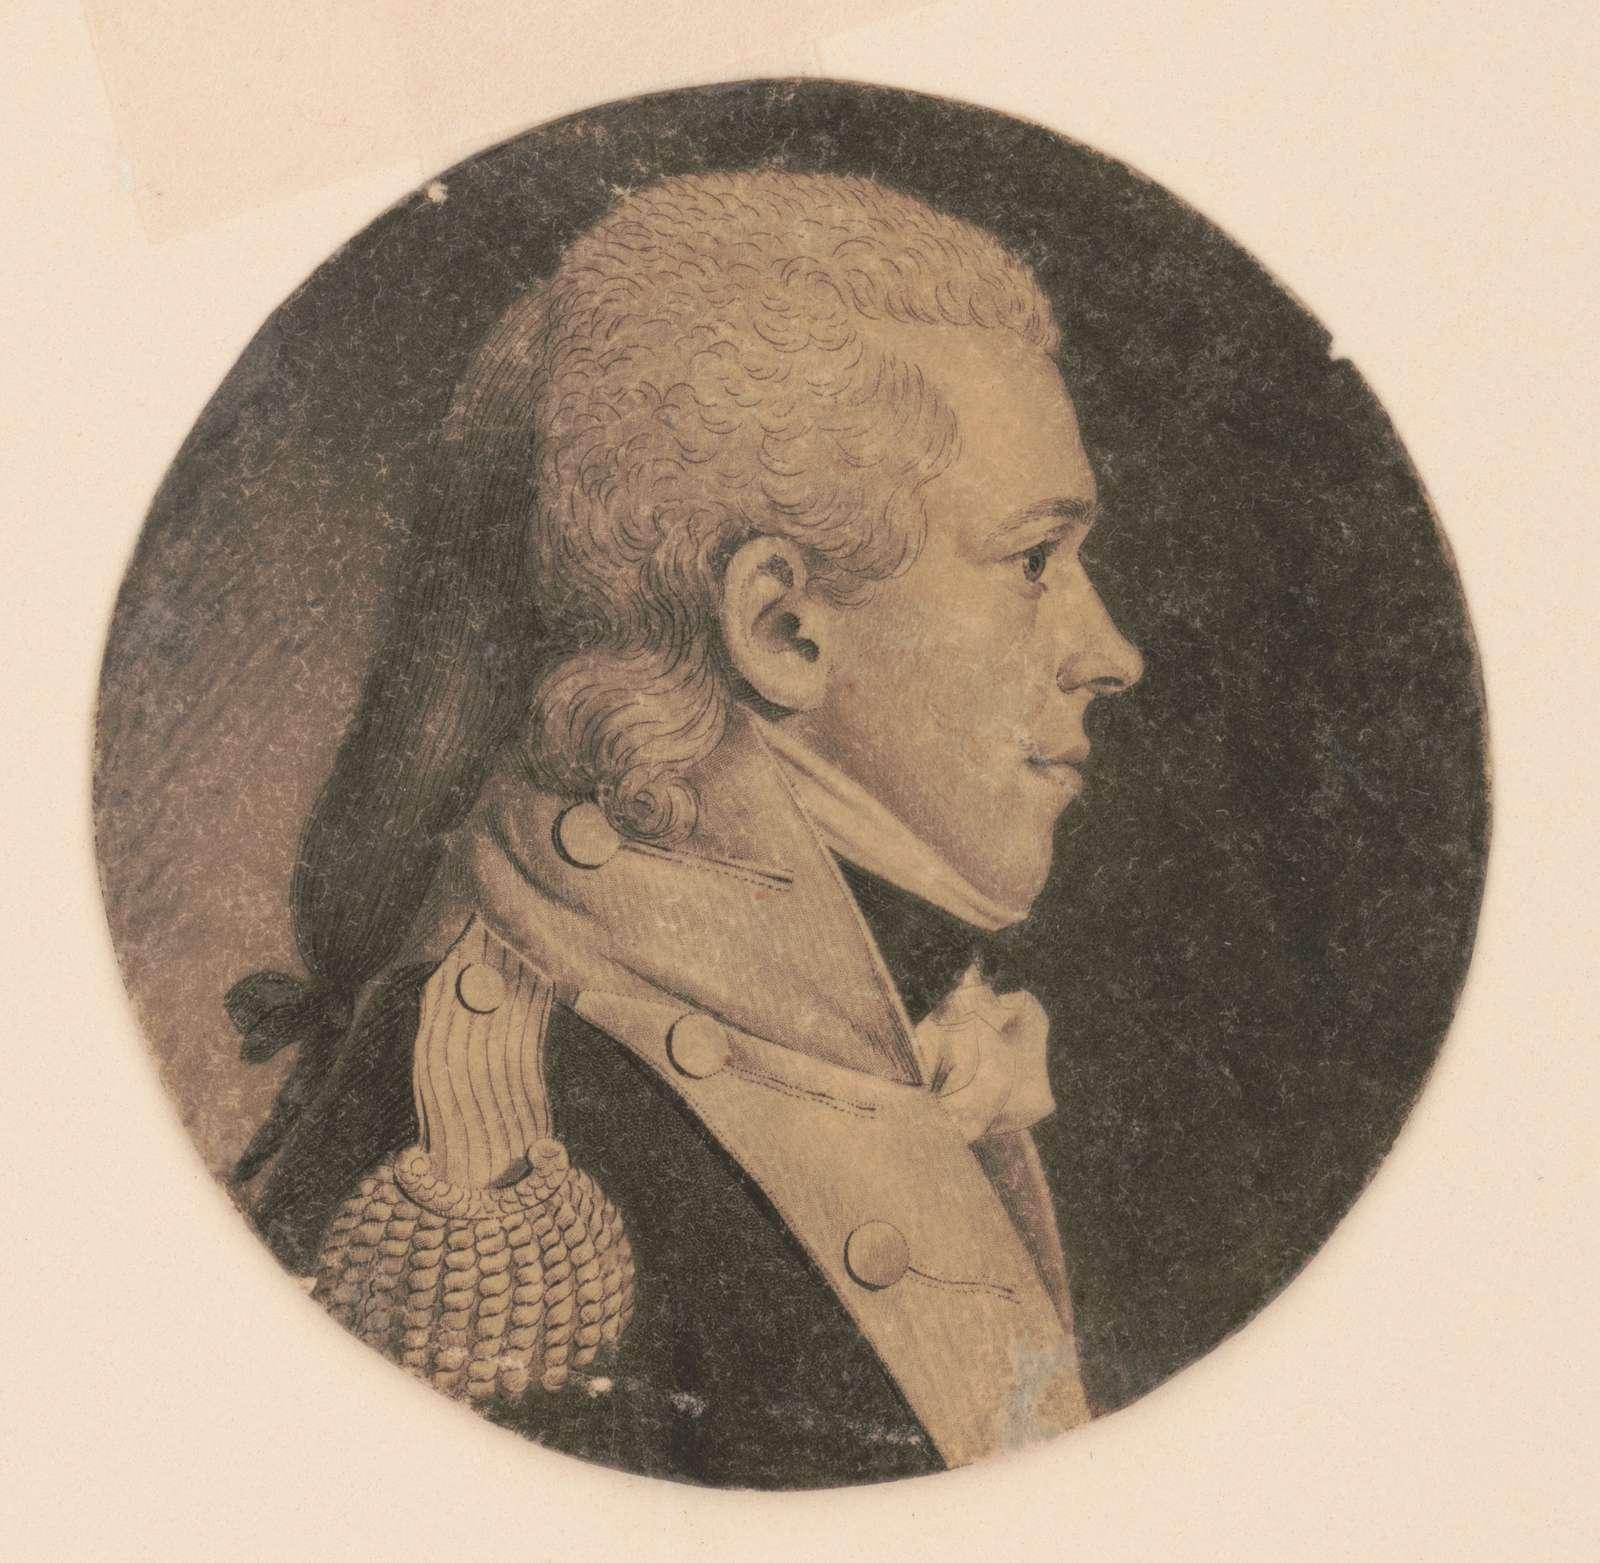 John Chew Thomas, head-and-shoulders portrait, right profile